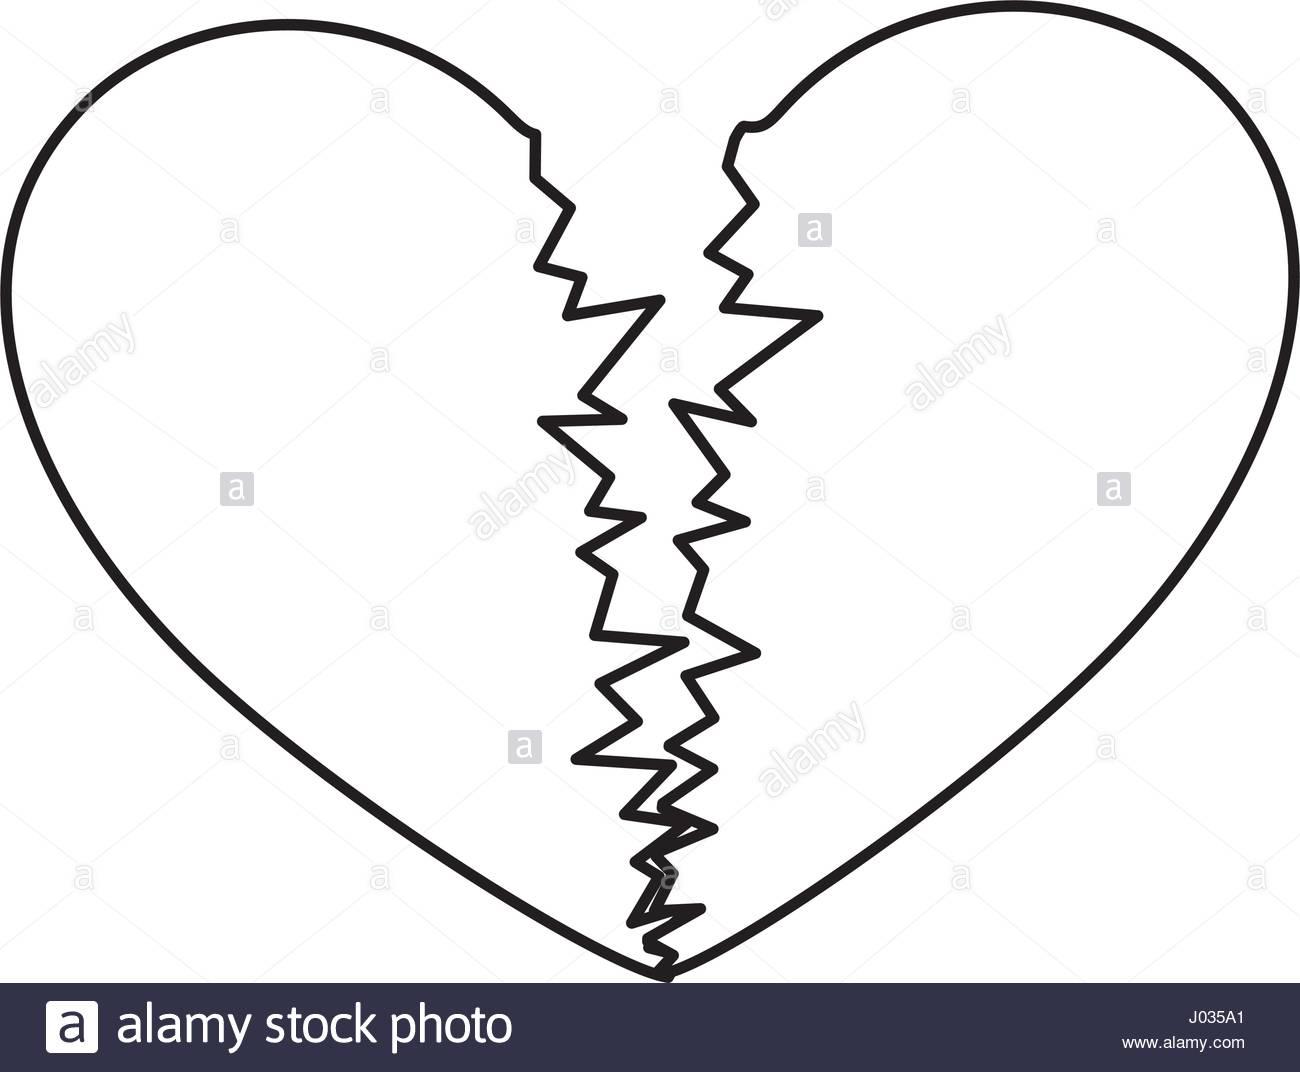 1300x1072 Sketch Silhouette Broken Heart Icon Flat Stock Vector Art